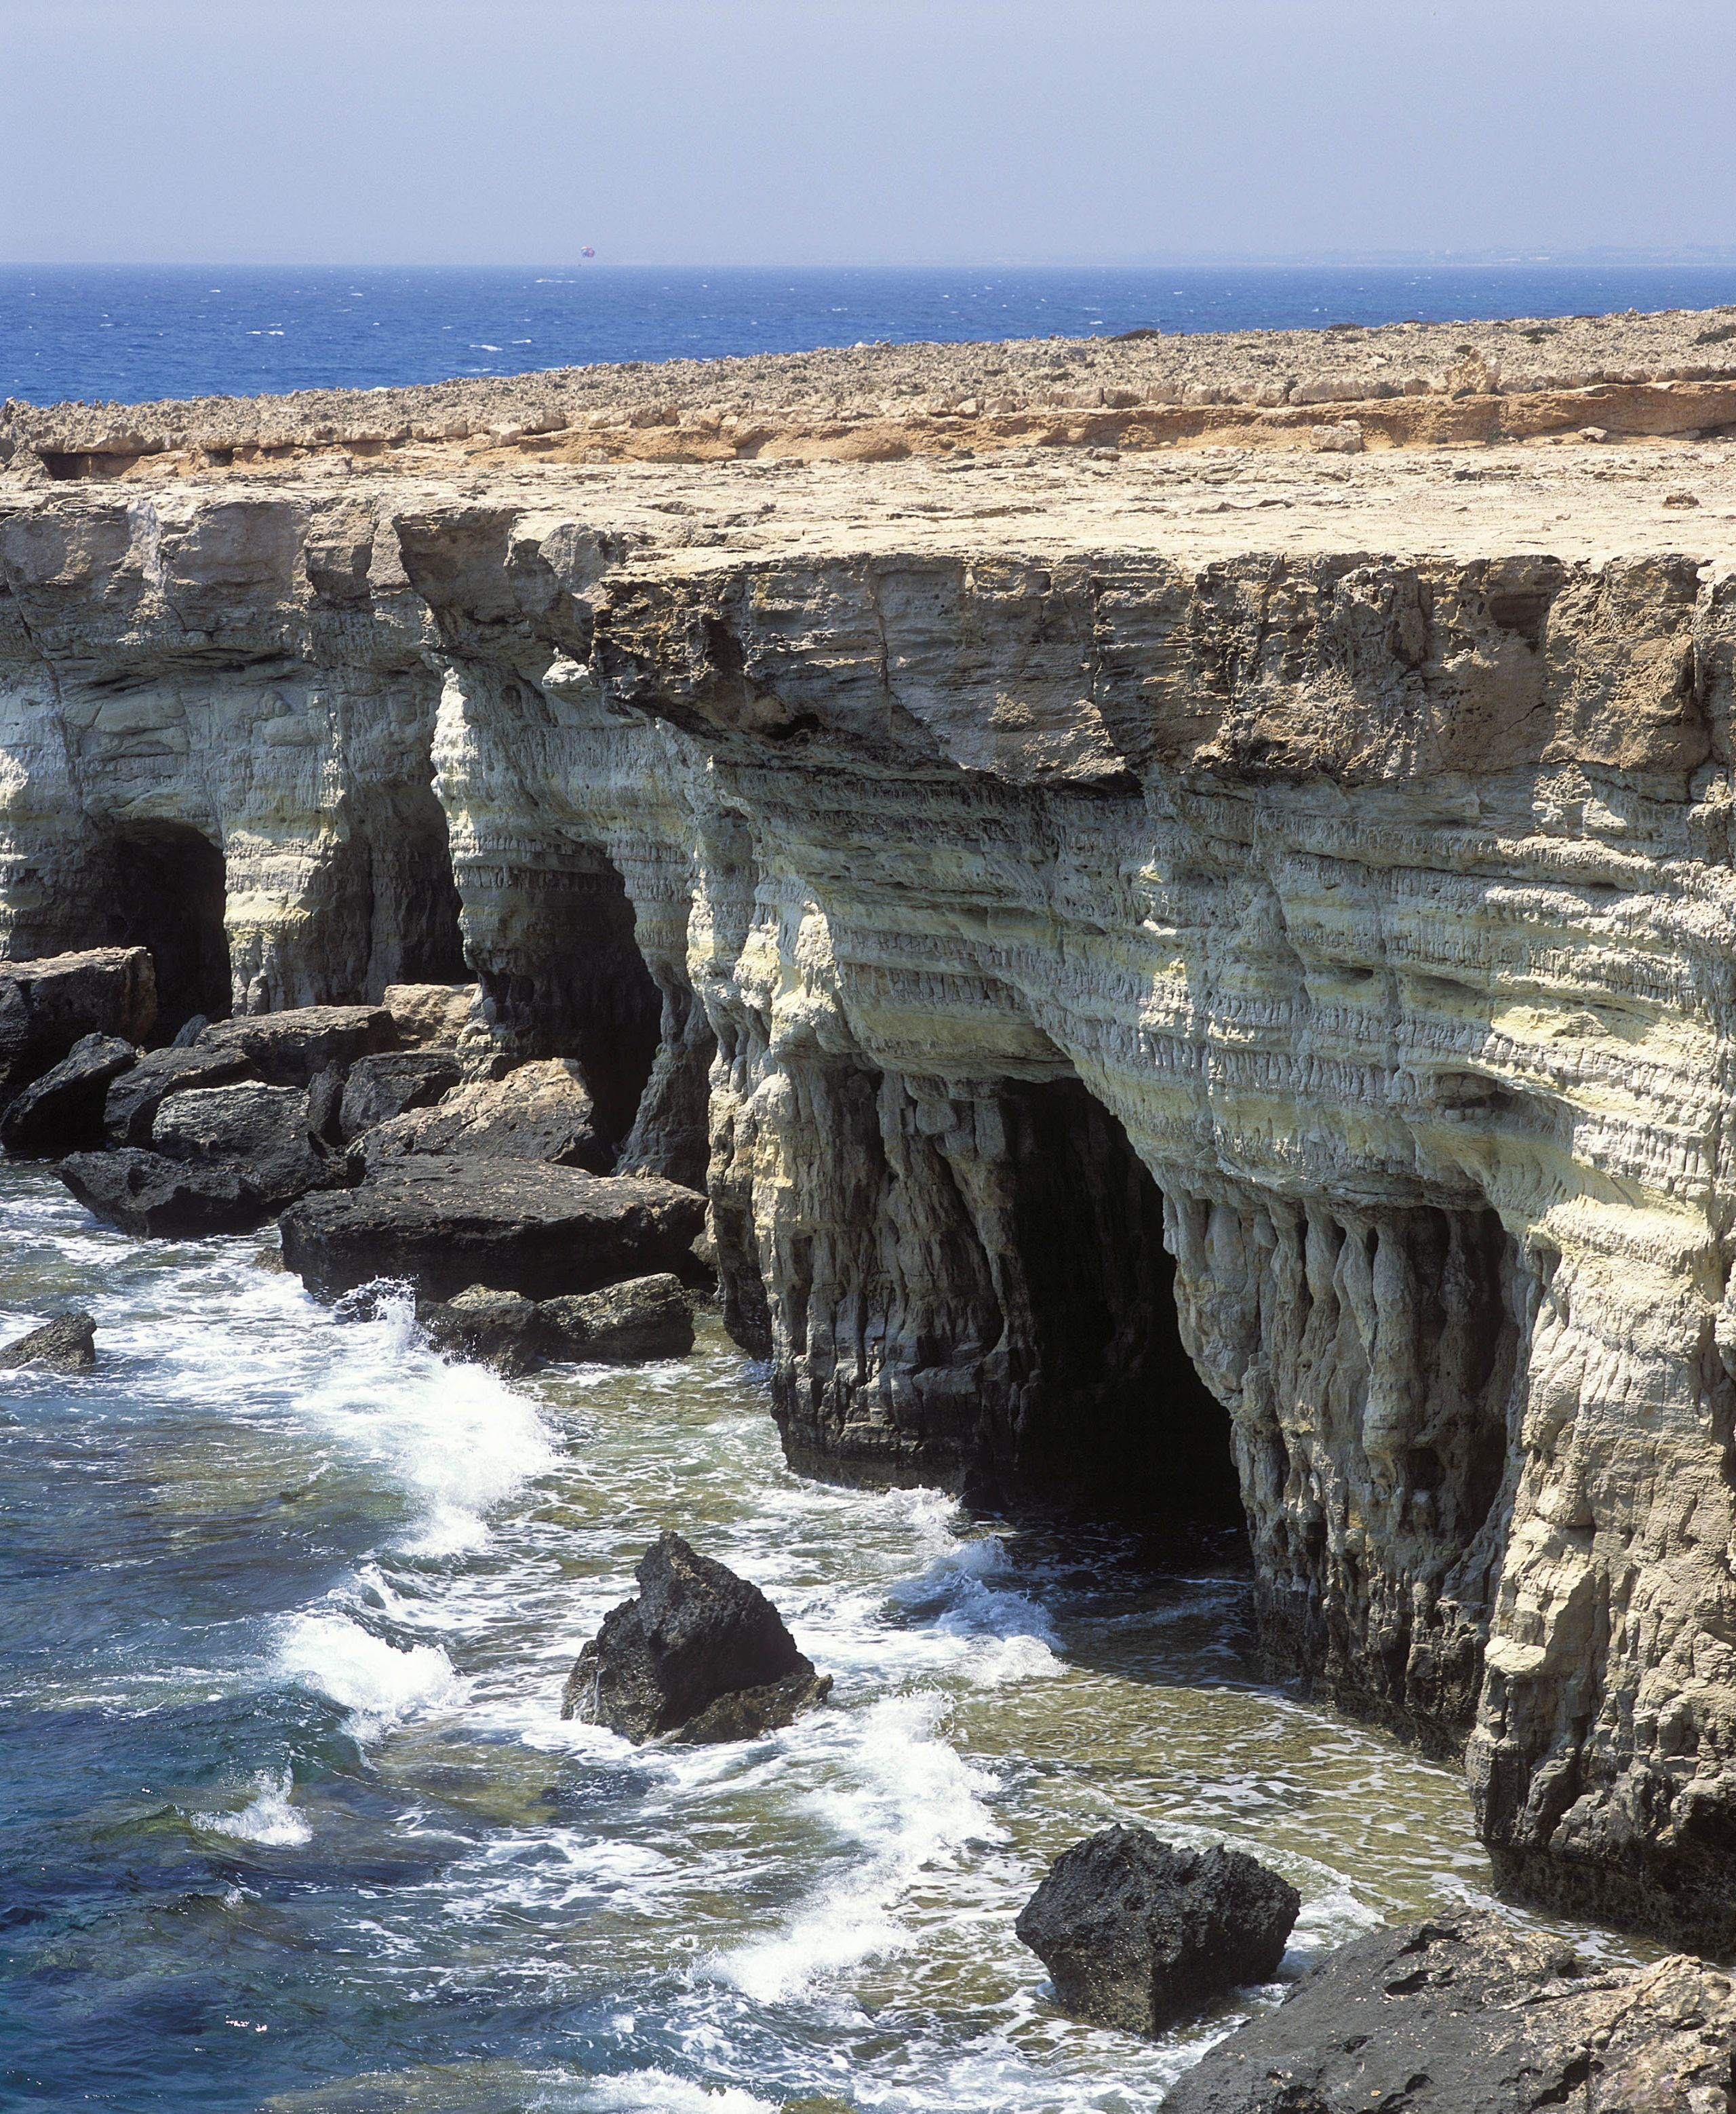 Kipriakí Dhimokratía / Κυπριακή Δημοκρατία / Kıbrıs Cumhuriyeti / Republic of Cyprus, Read articles at: http://www.whattravelwriterssay.com